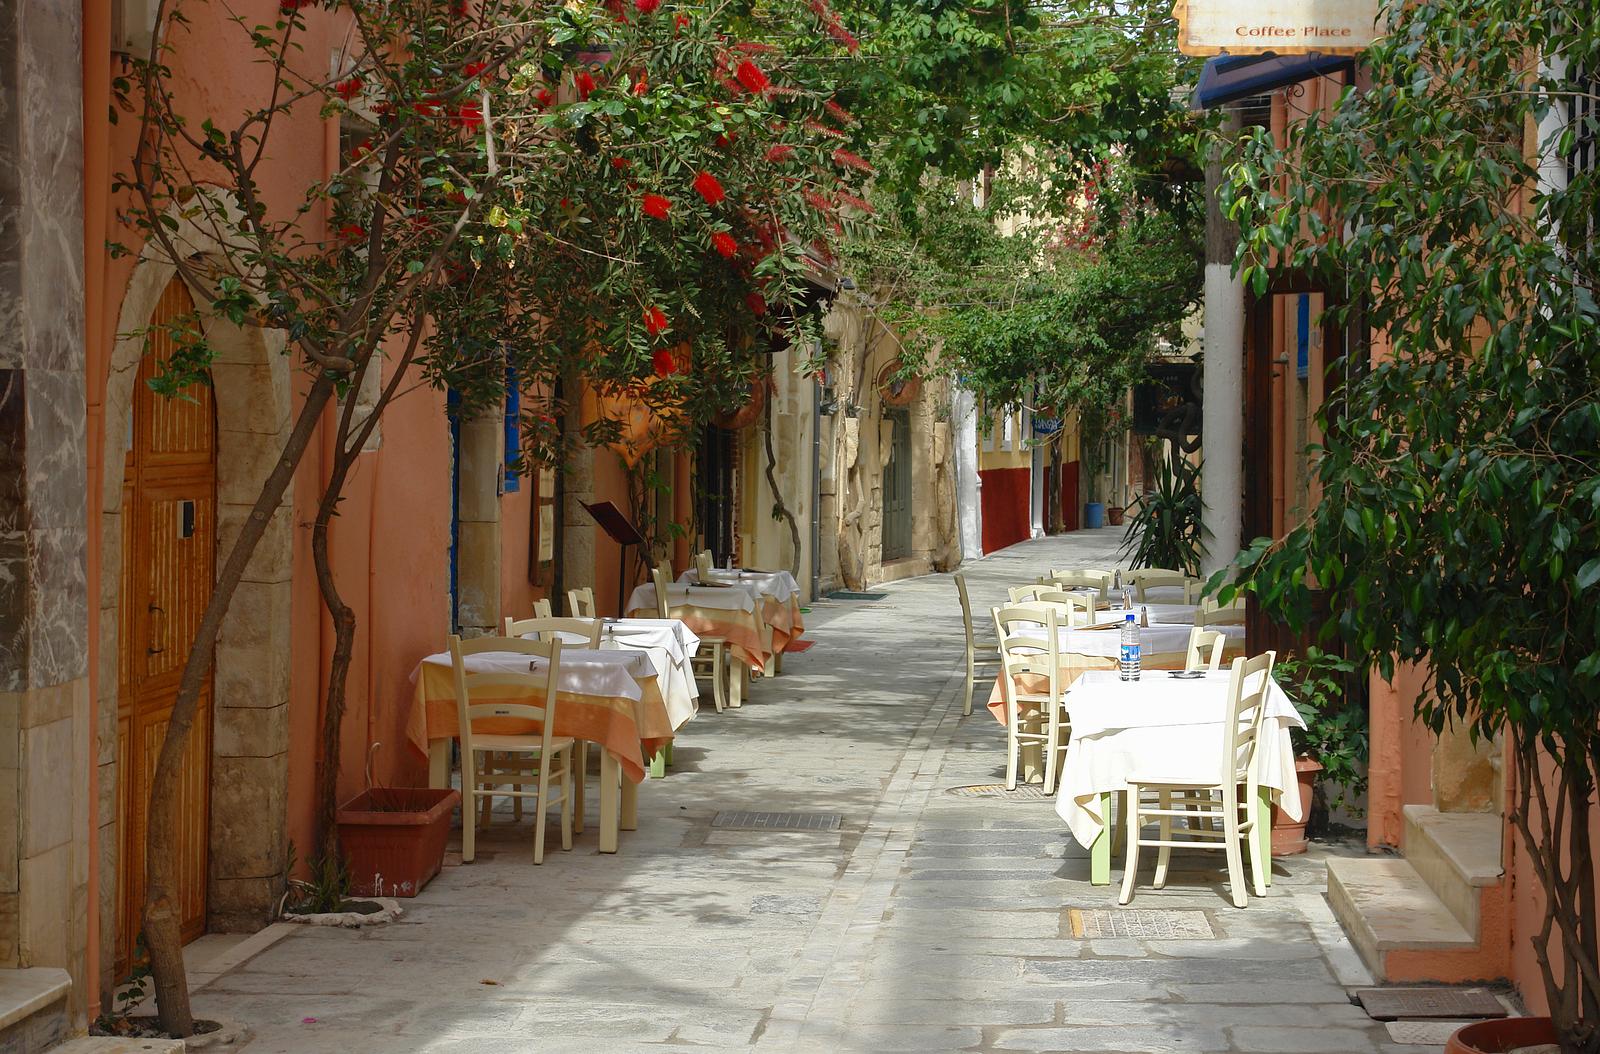 Rethymnon, Crete Island, Greece.